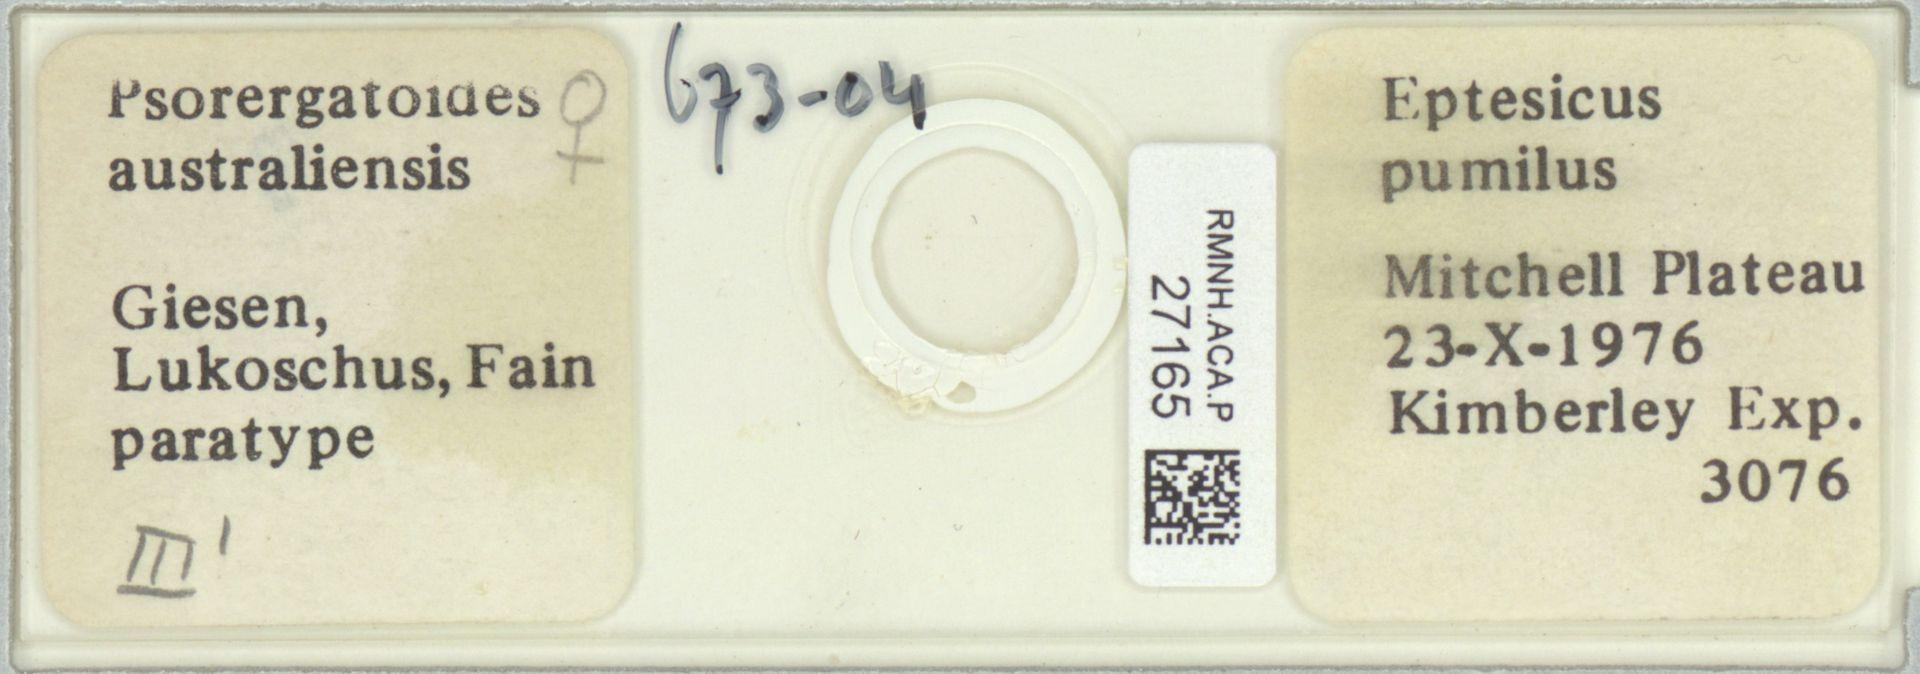 RMNH.ACA.P.27165 | Psorergatoides australiensis Giesen, Lukoschus, Fain